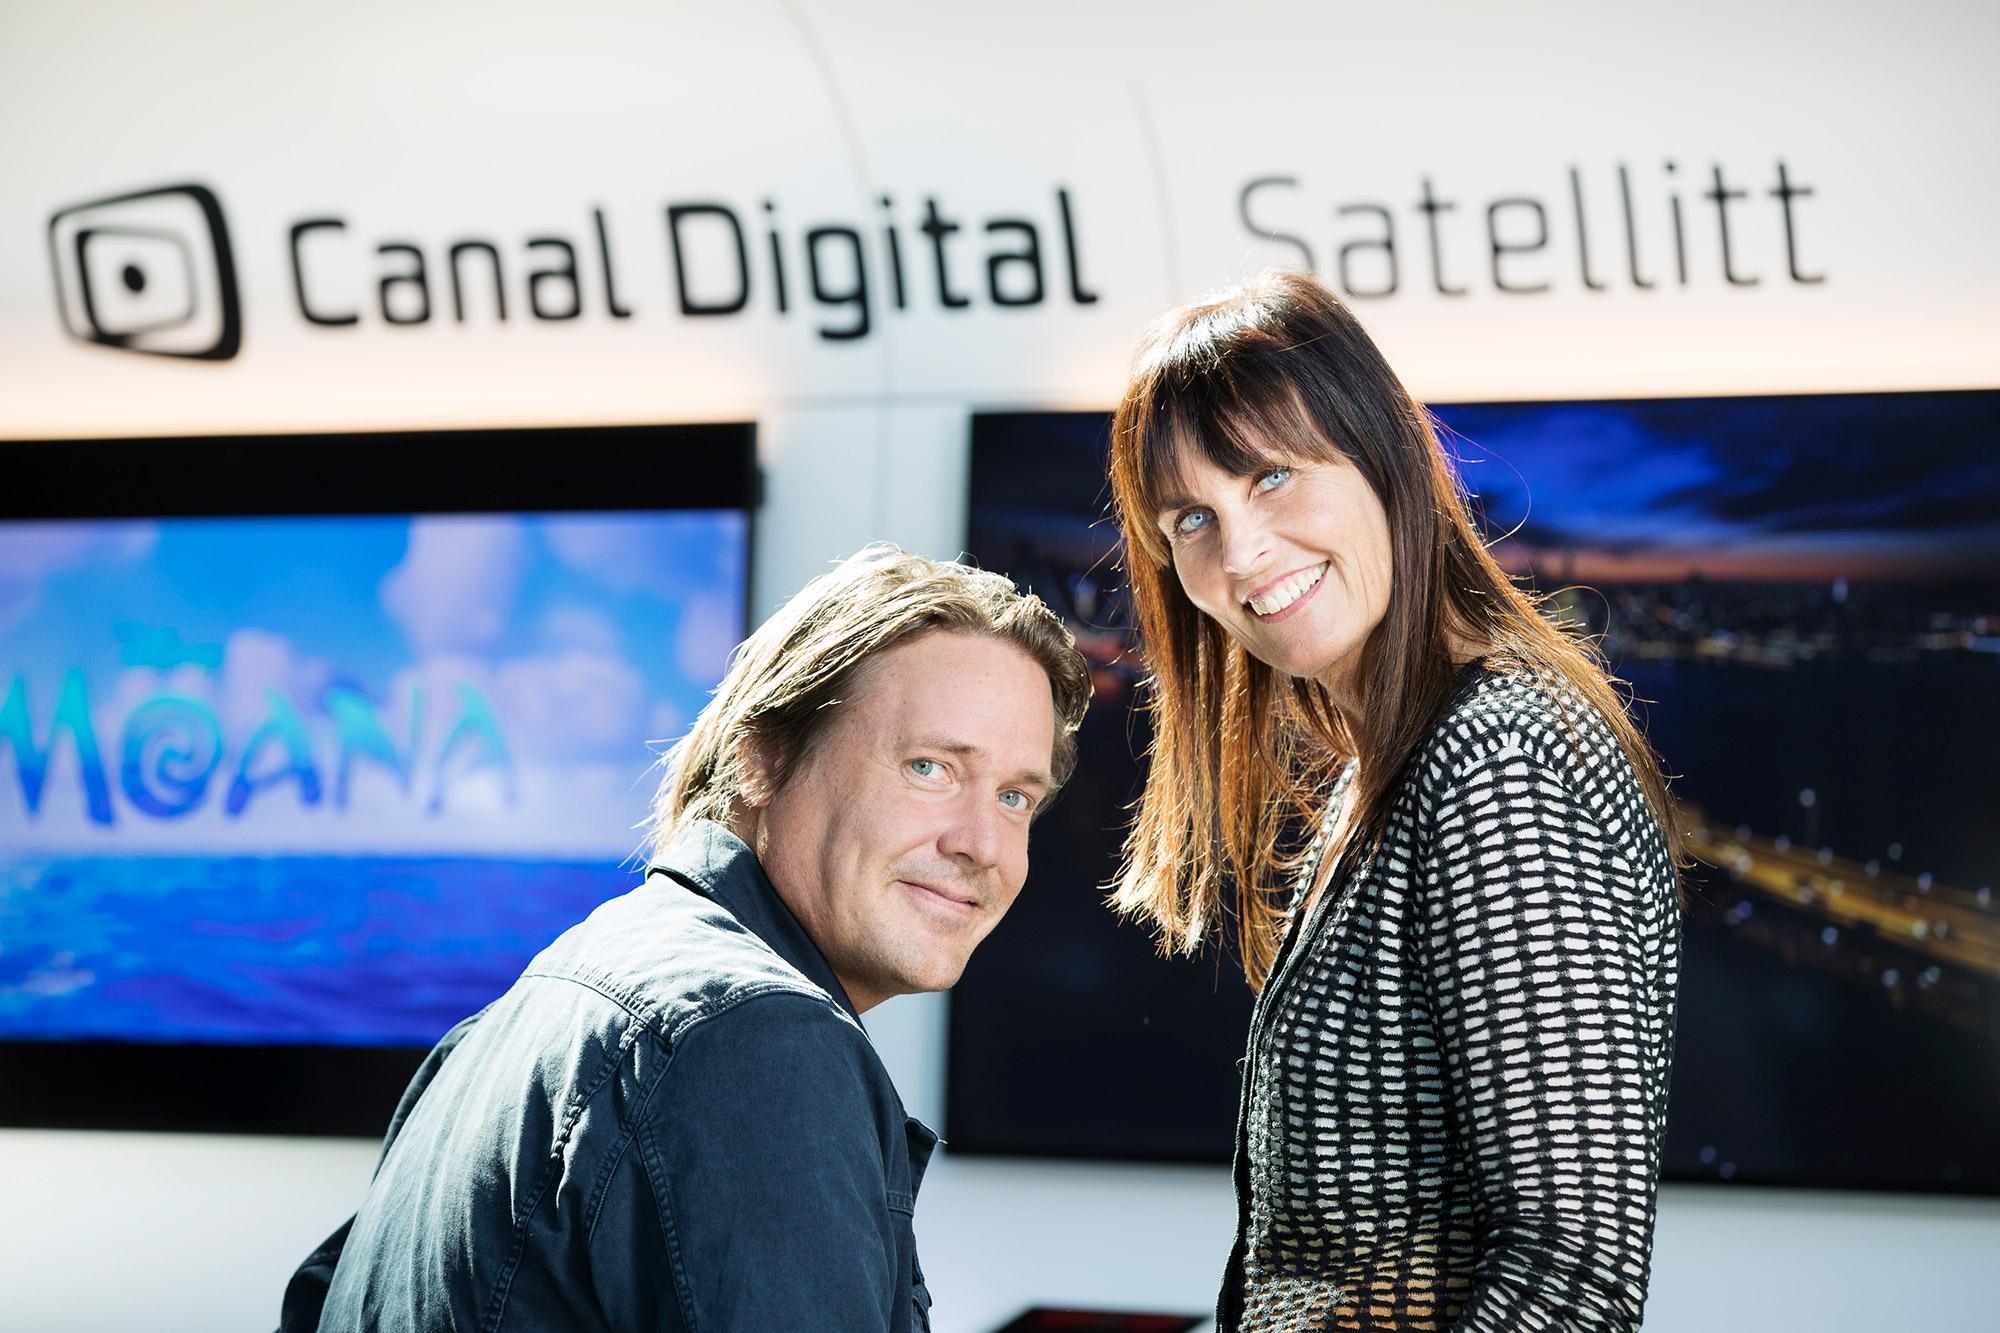 Canal-digital-mamm-dame-digital-signage